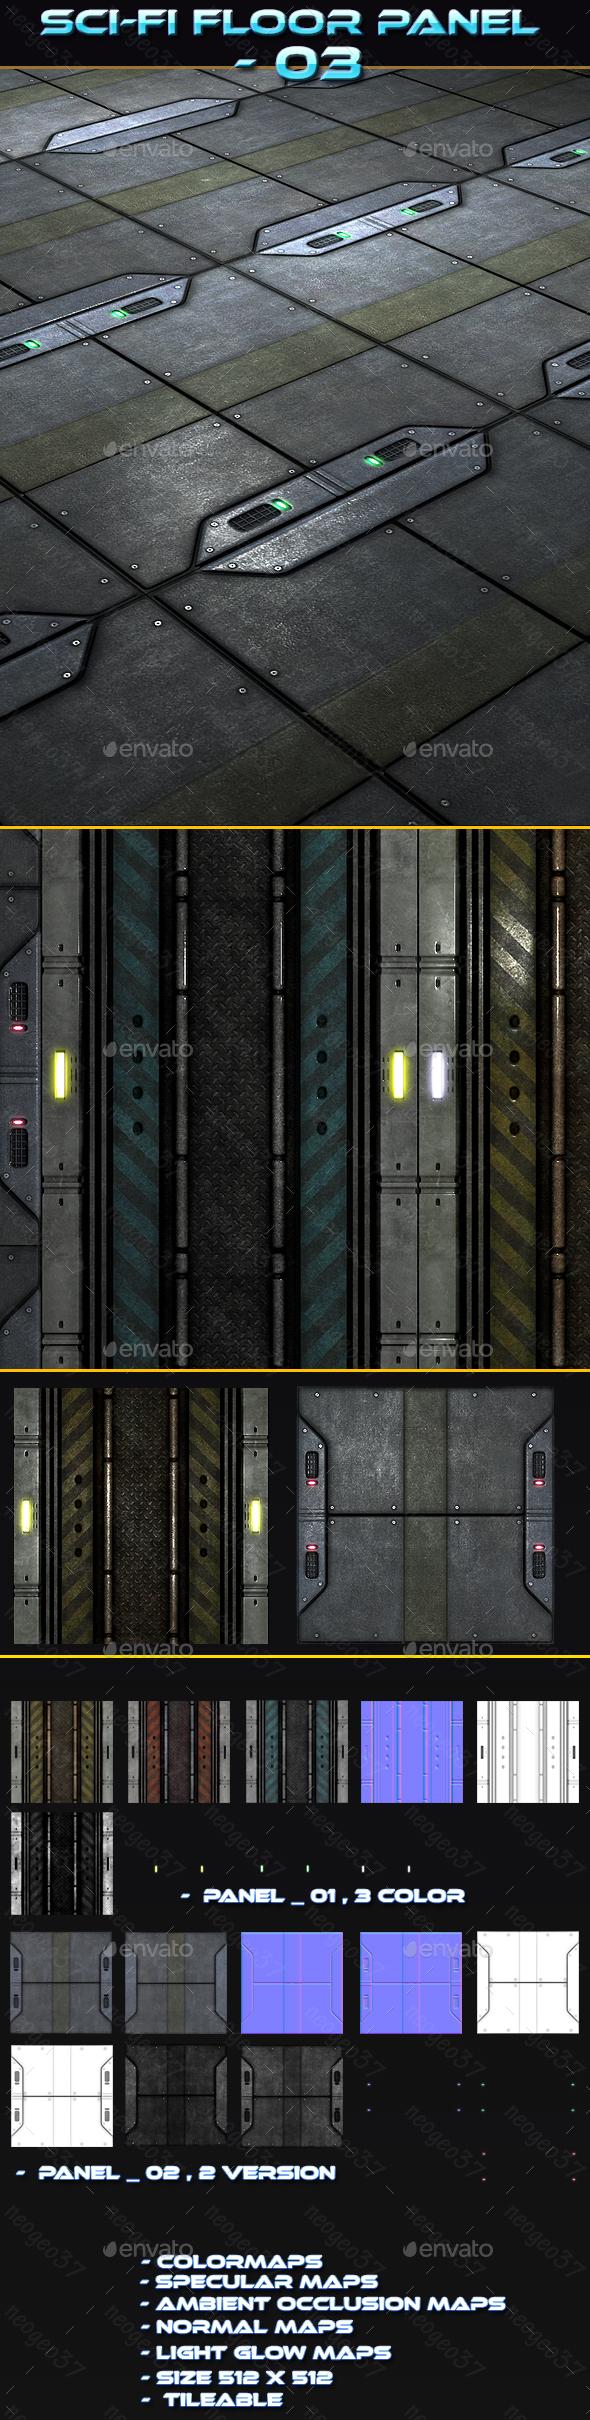 Sci-fi Floor Panel 03